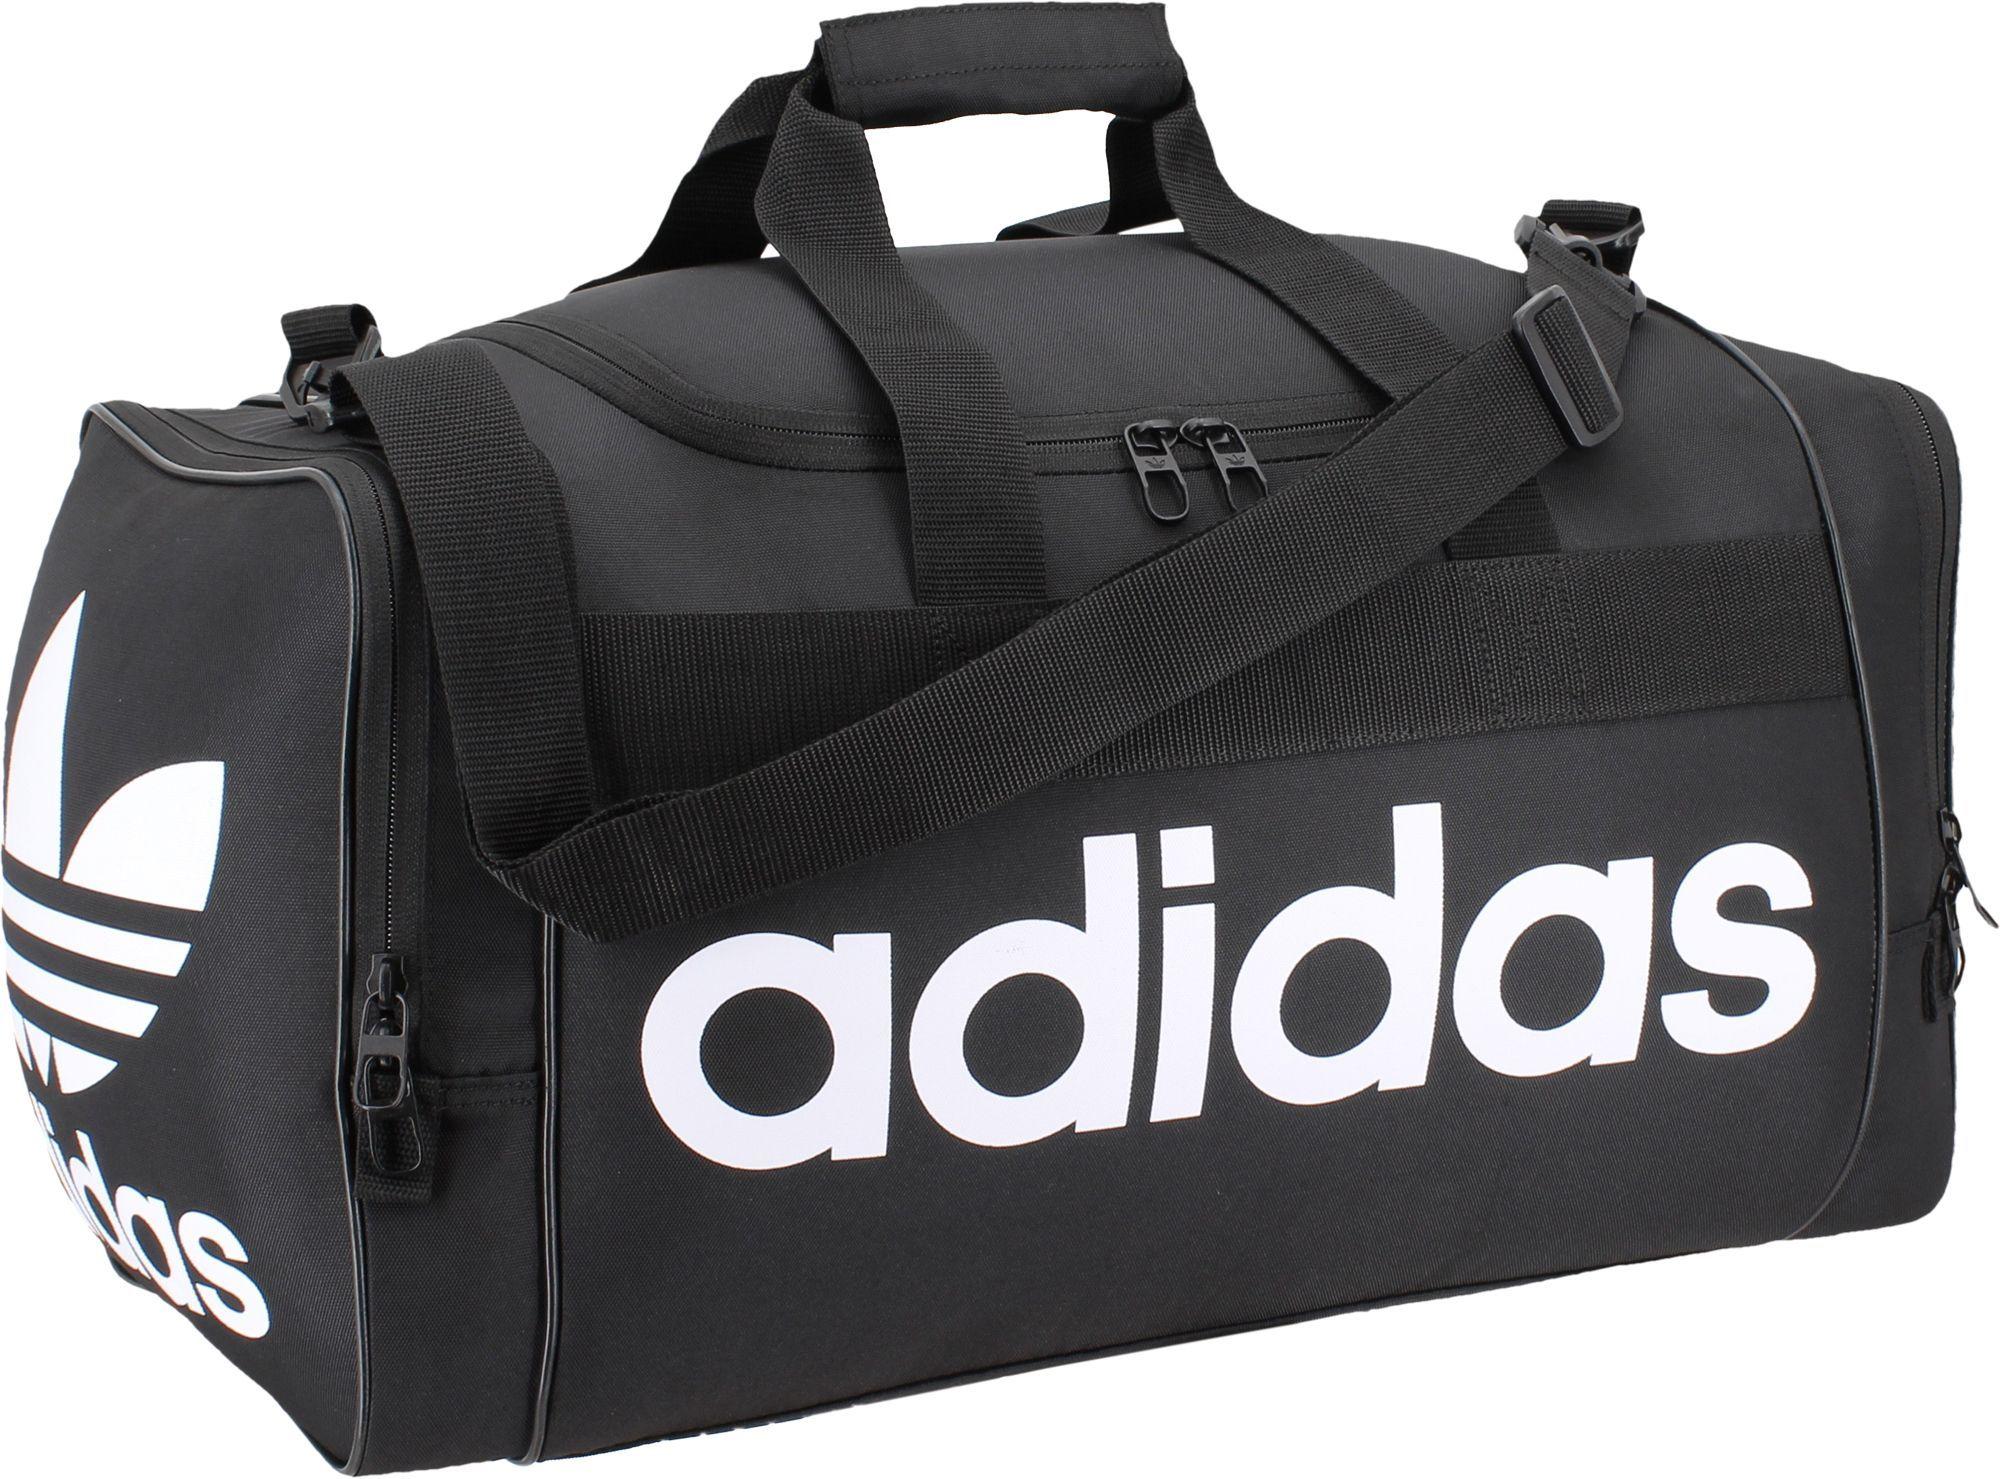 Adidas Originals Santiago Duffle Bag Black Duffel Bag Gym Bag